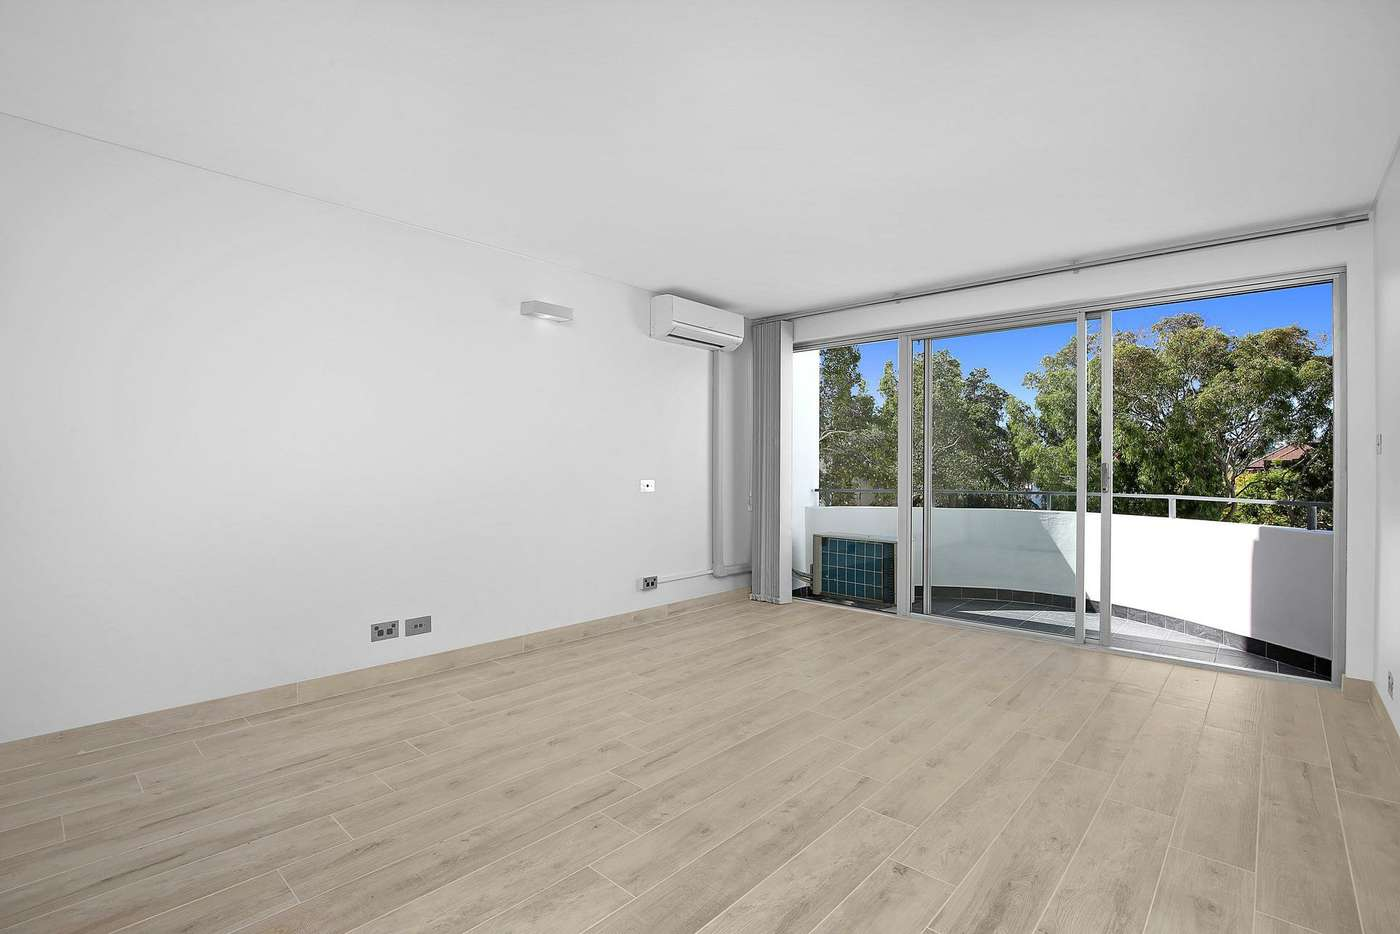 Main view of Homely apartment listing, 11/81 Hall Street, Bondi Beach NSW 2026